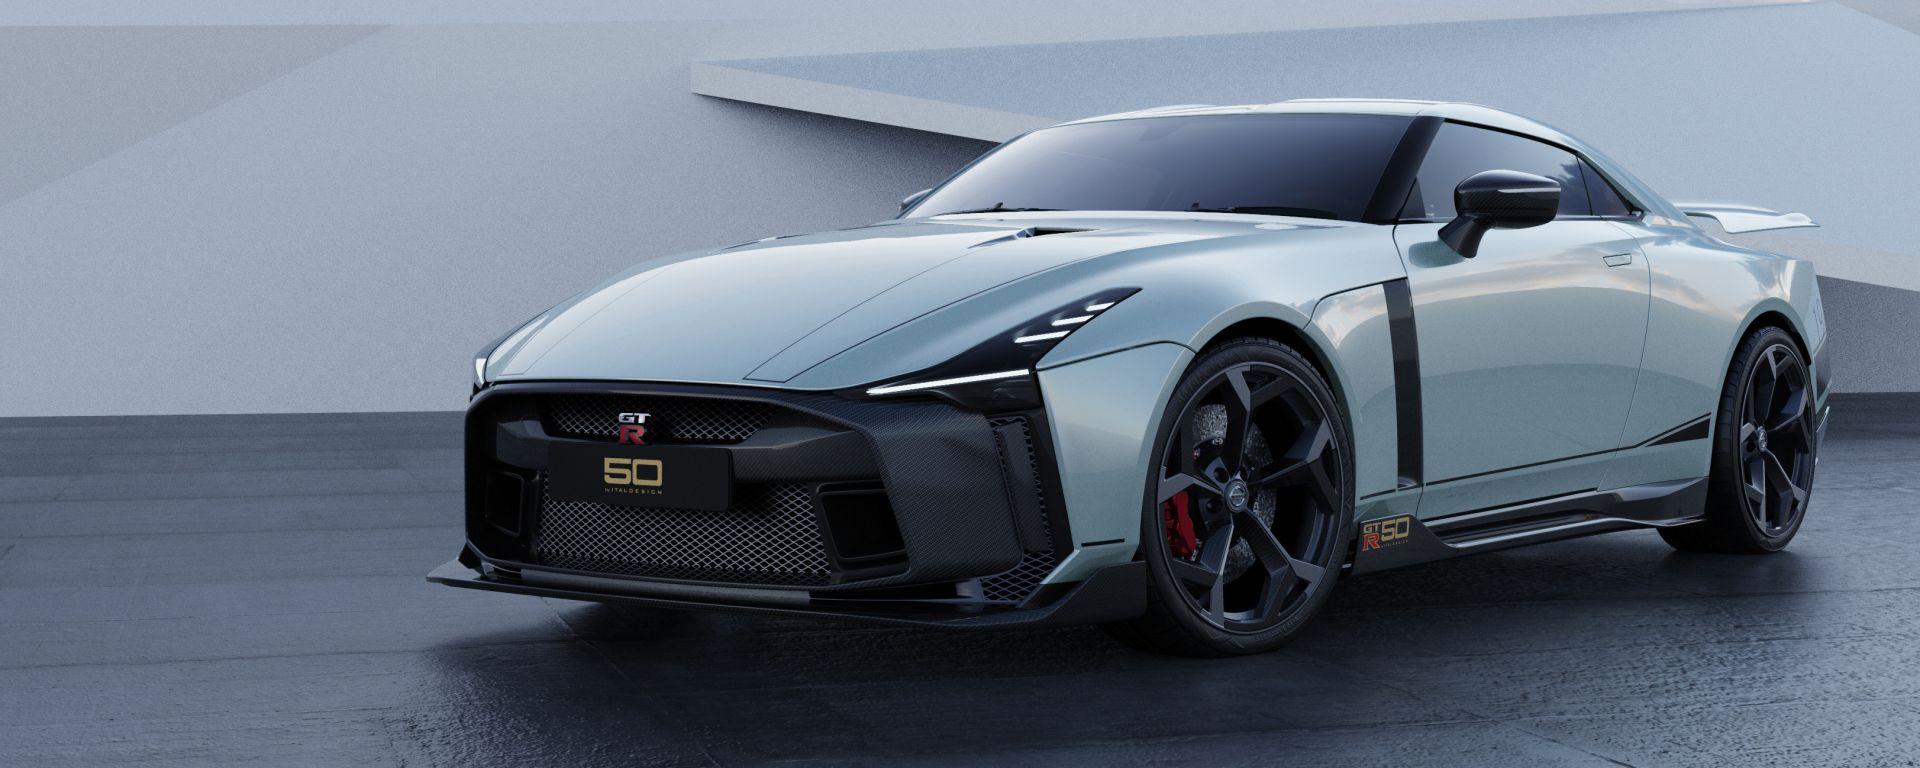 Nissan GT-R50 by Italdesign: la muscle car italo/nipponica in consegna a fine 2020